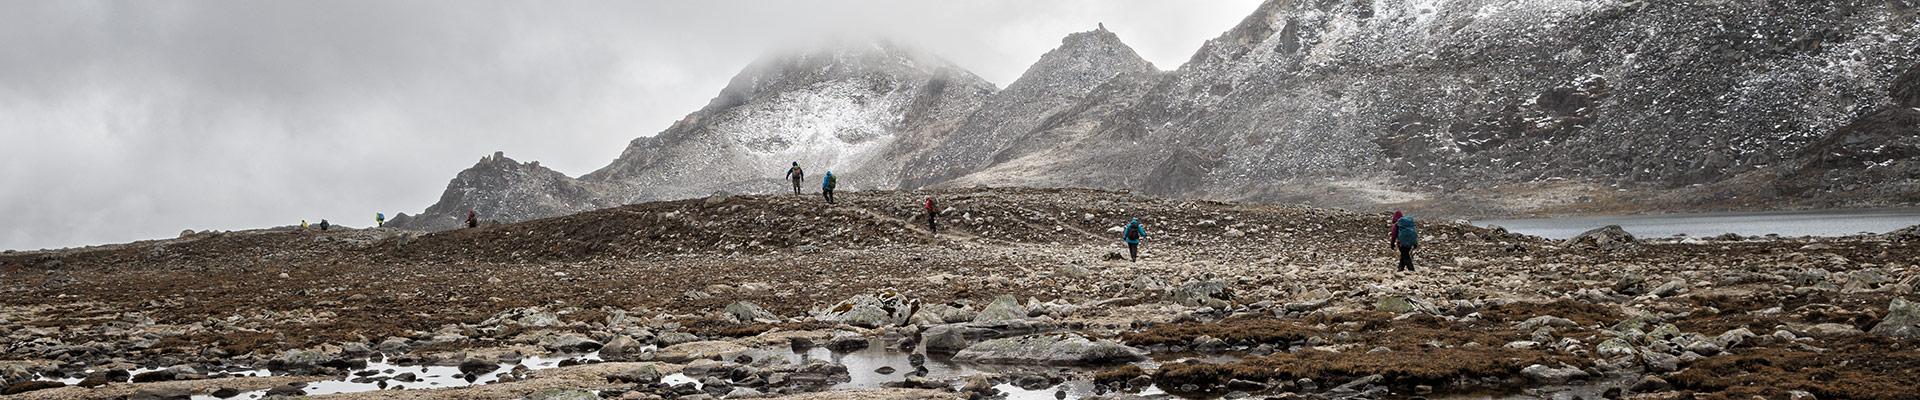 Top image trekkeurs en route pour Tshochena, Bhoutan